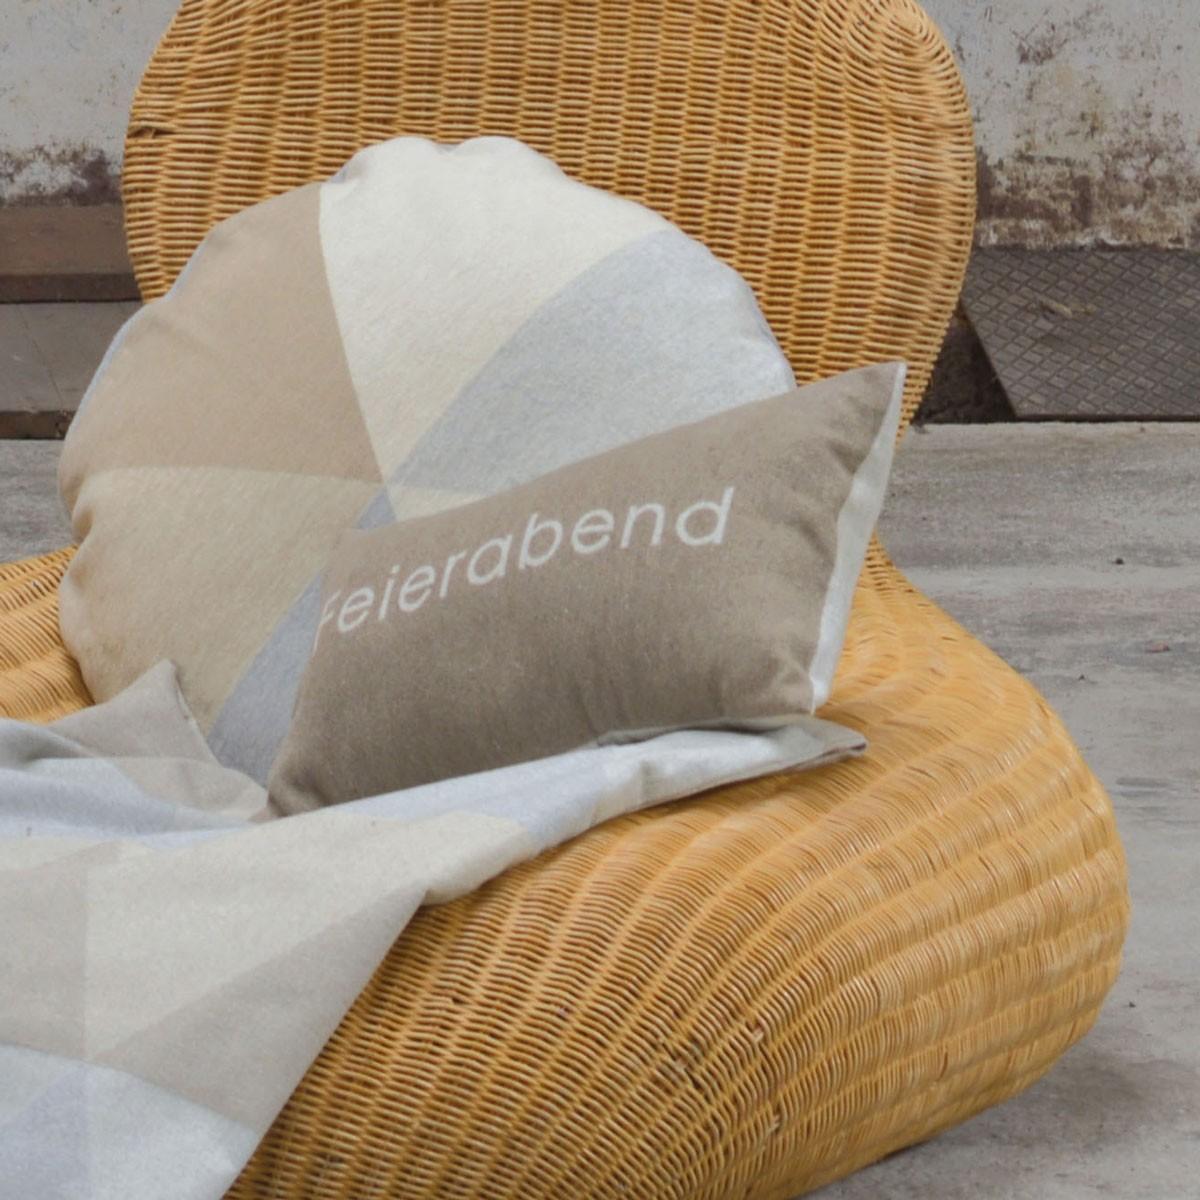 silvretta kissenh lle feierabend 30 x 50 cm von david fussenegger. Black Bedroom Furniture Sets. Home Design Ideas